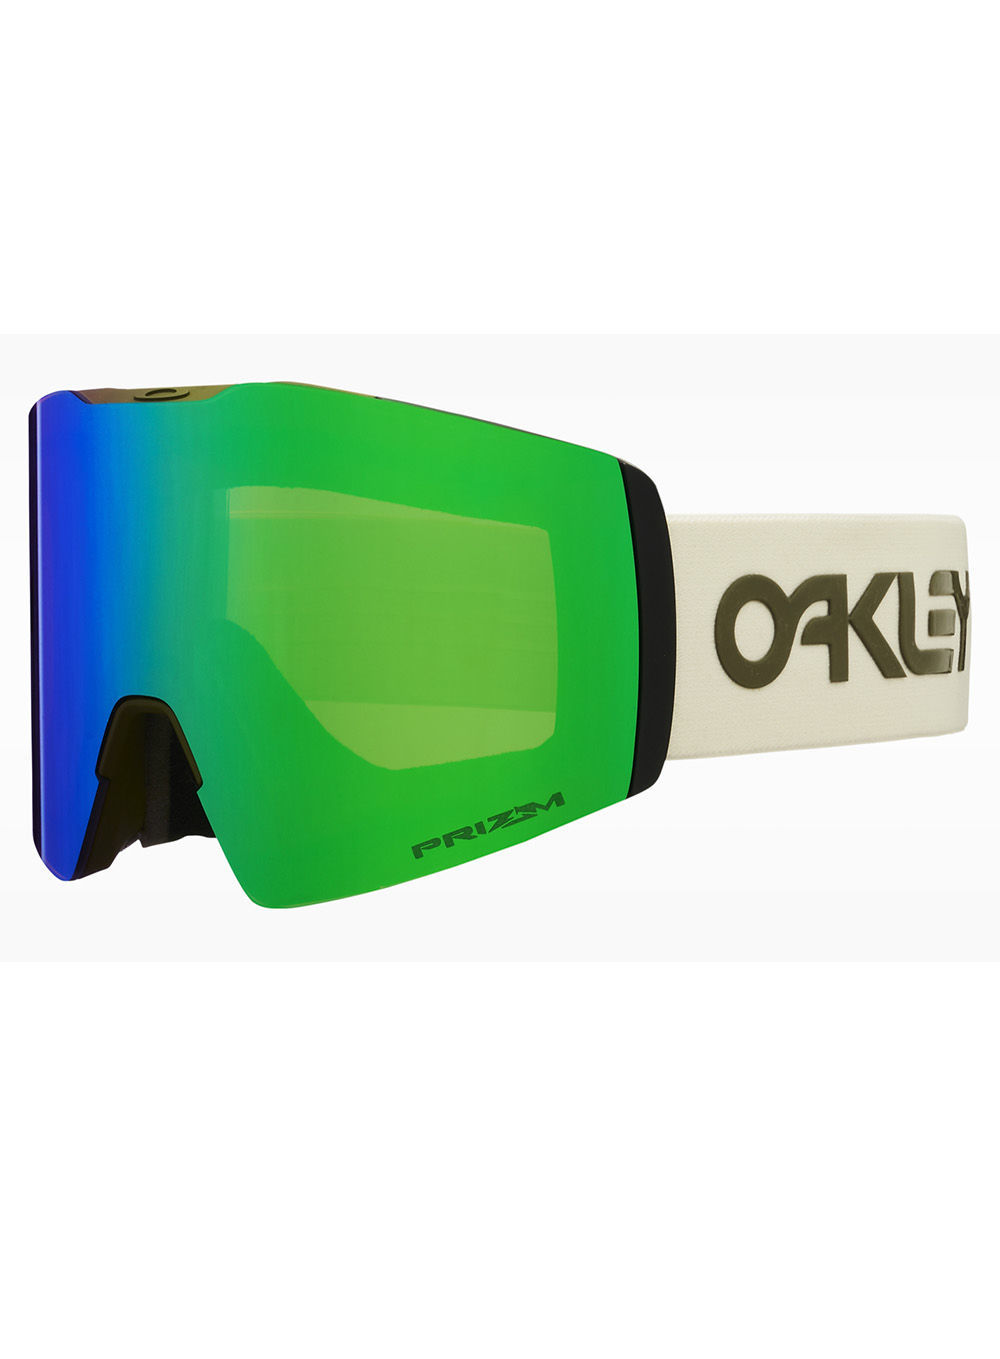 Bilde av Oakley Fall Line XL FP, DKBrsh Grey w/Prizm Jade GBL